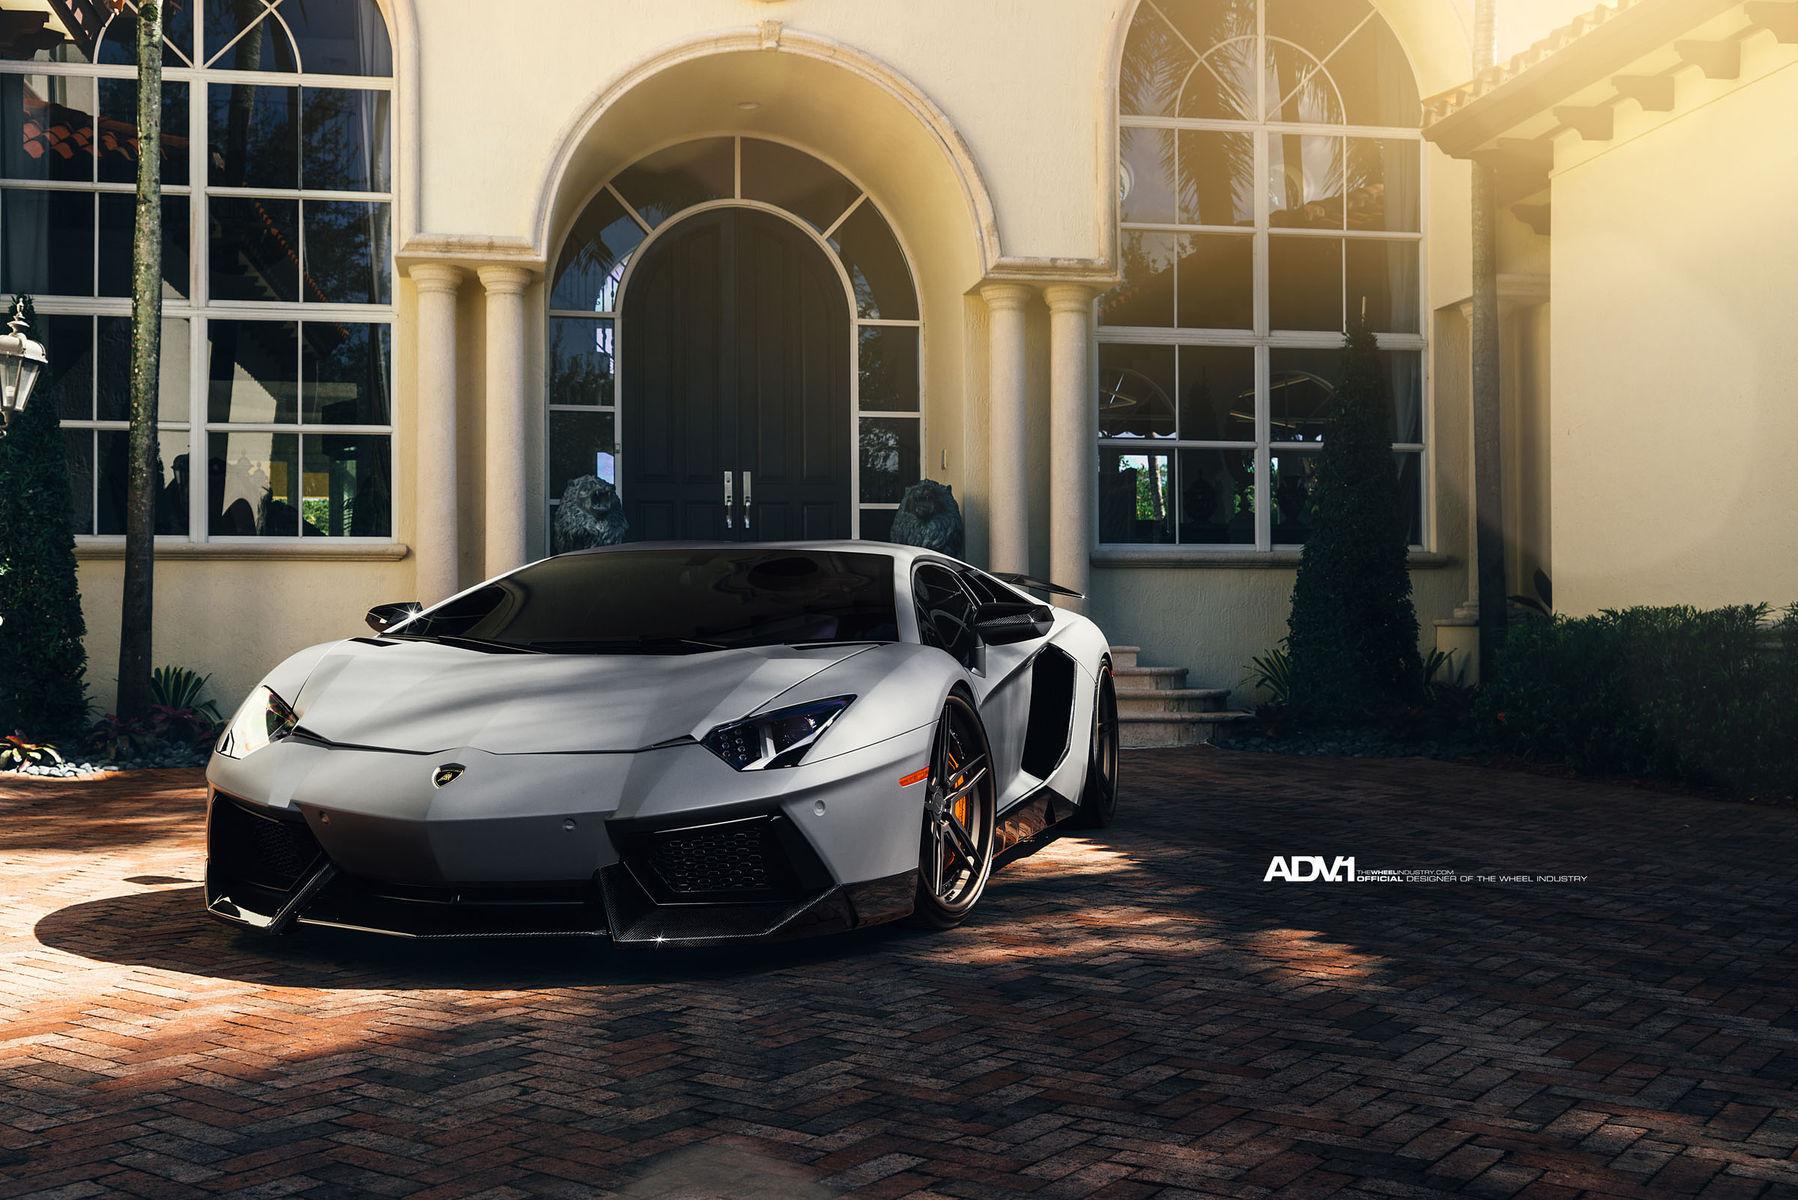 Lamborghini Aventador | ADV.1 Wheels | Lamborghini Aventador